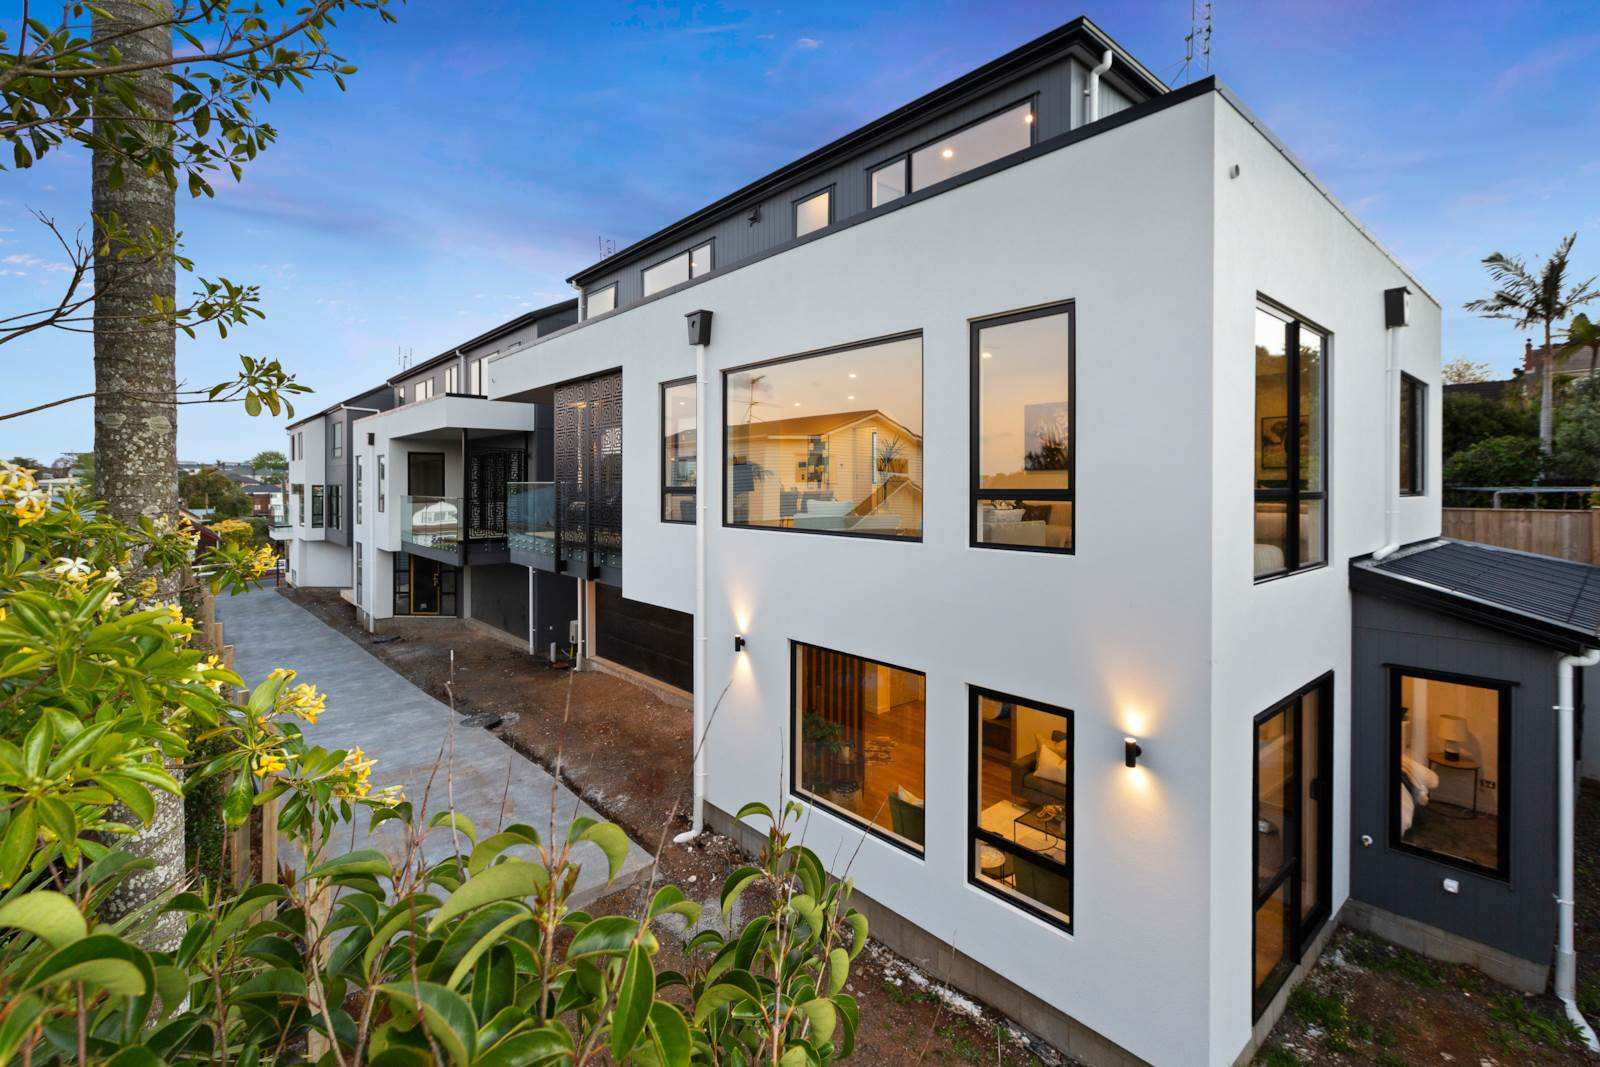 Epsom 5房 双校网全新奢居 设计&工艺无懈可击 亮点多多 10年质保 轻松打造一个难忘的家! Luxurious Living - Enviable Address DGZ